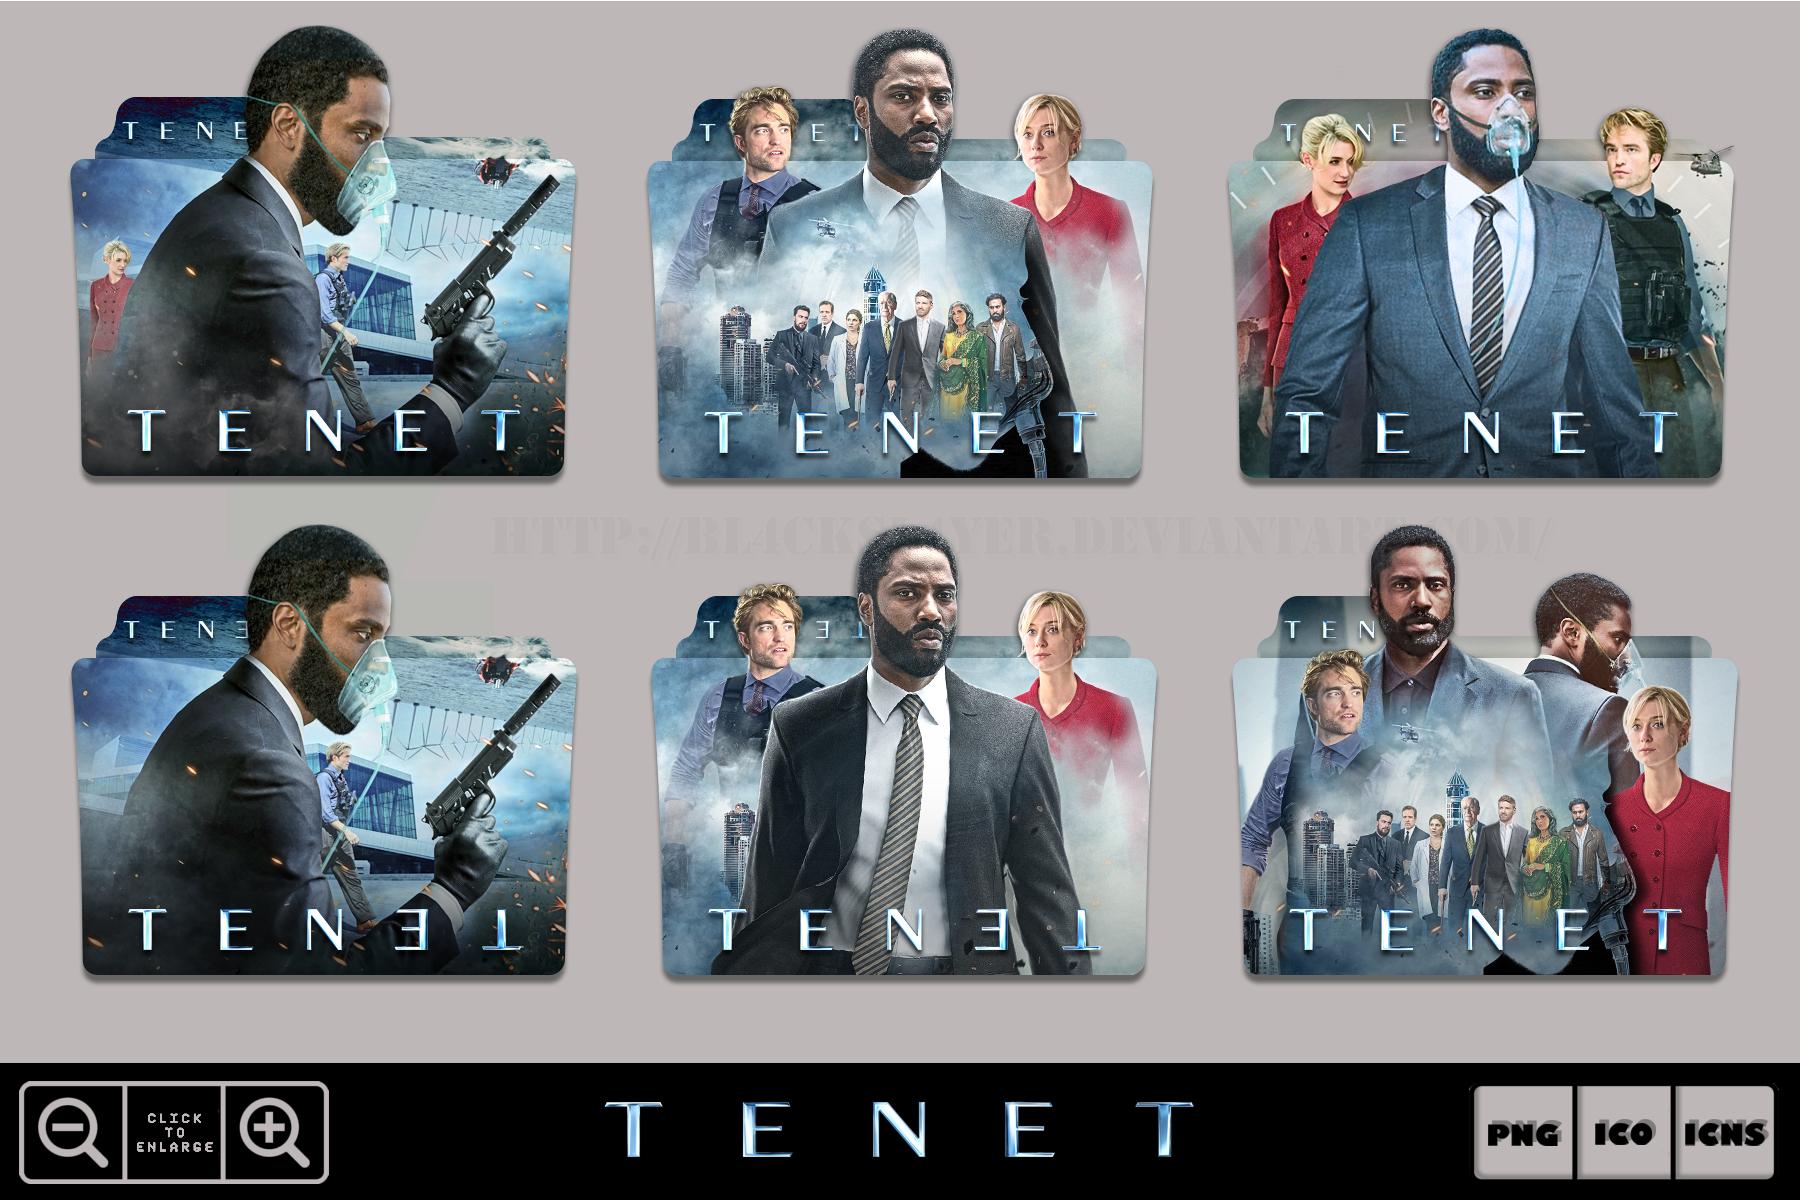 Tenet 2020 Movie Folder Icon Pack By Bl4cksl4yer On Deviantart